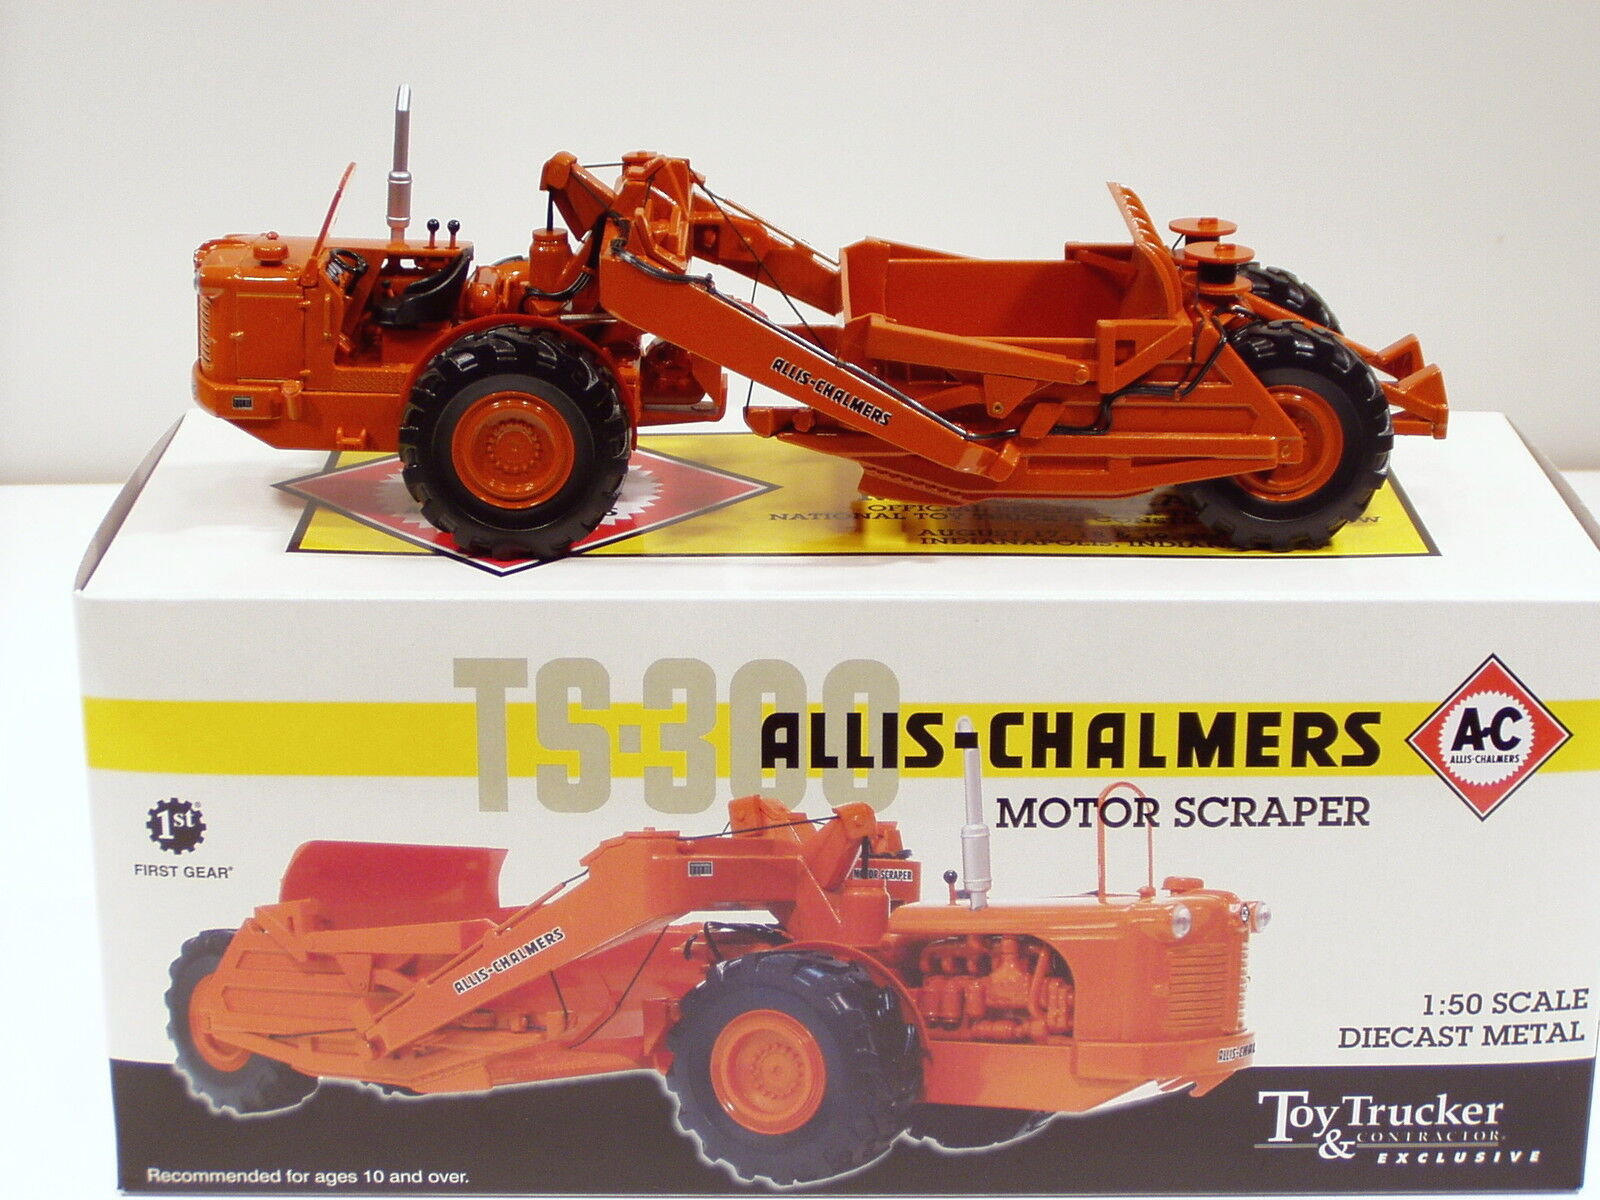 Allis Chalmers TS300 Grattoir -  2007 NTTC  - 1 50 - FIRST GEAR  50-3099